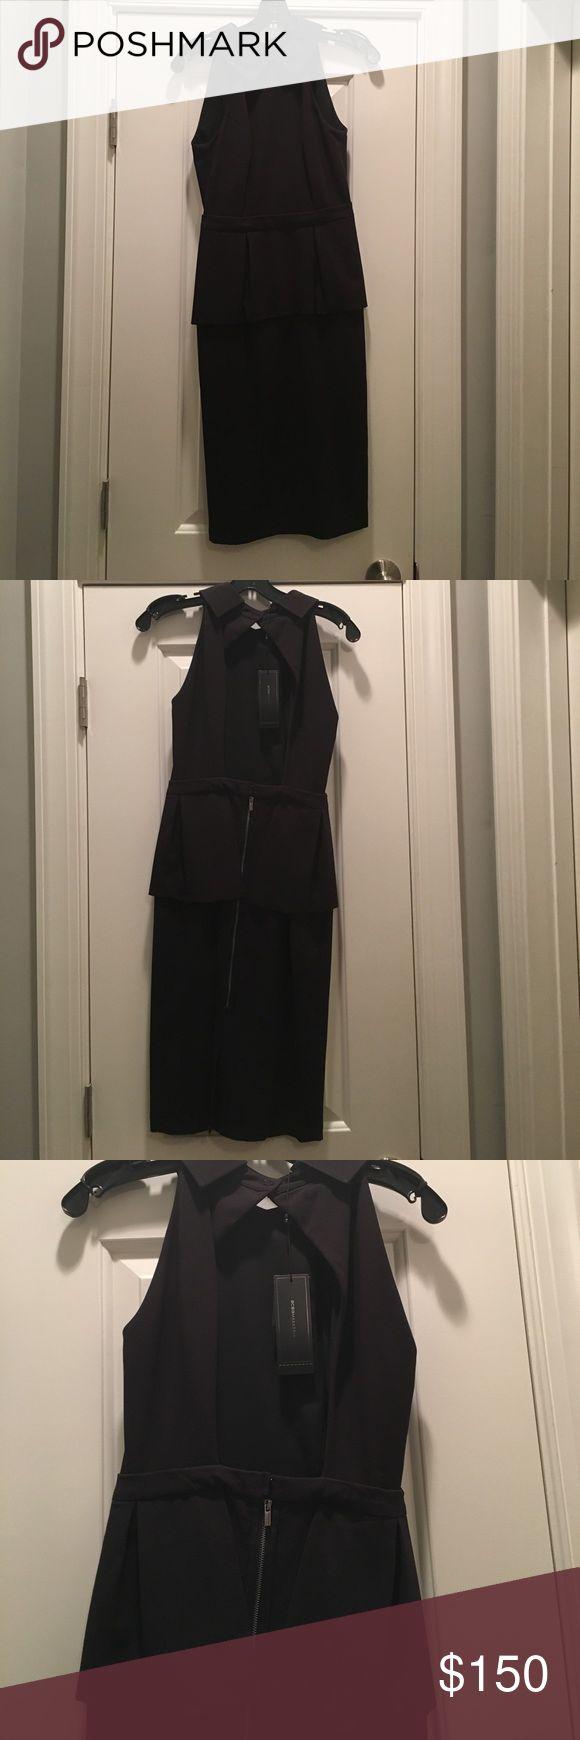 BCBG Maxazria Black Dress BCBG Black peplum dress with open back.  Size 0.  Never been worn.  Tag still on. BCBGMaxAzria Dresses Midi